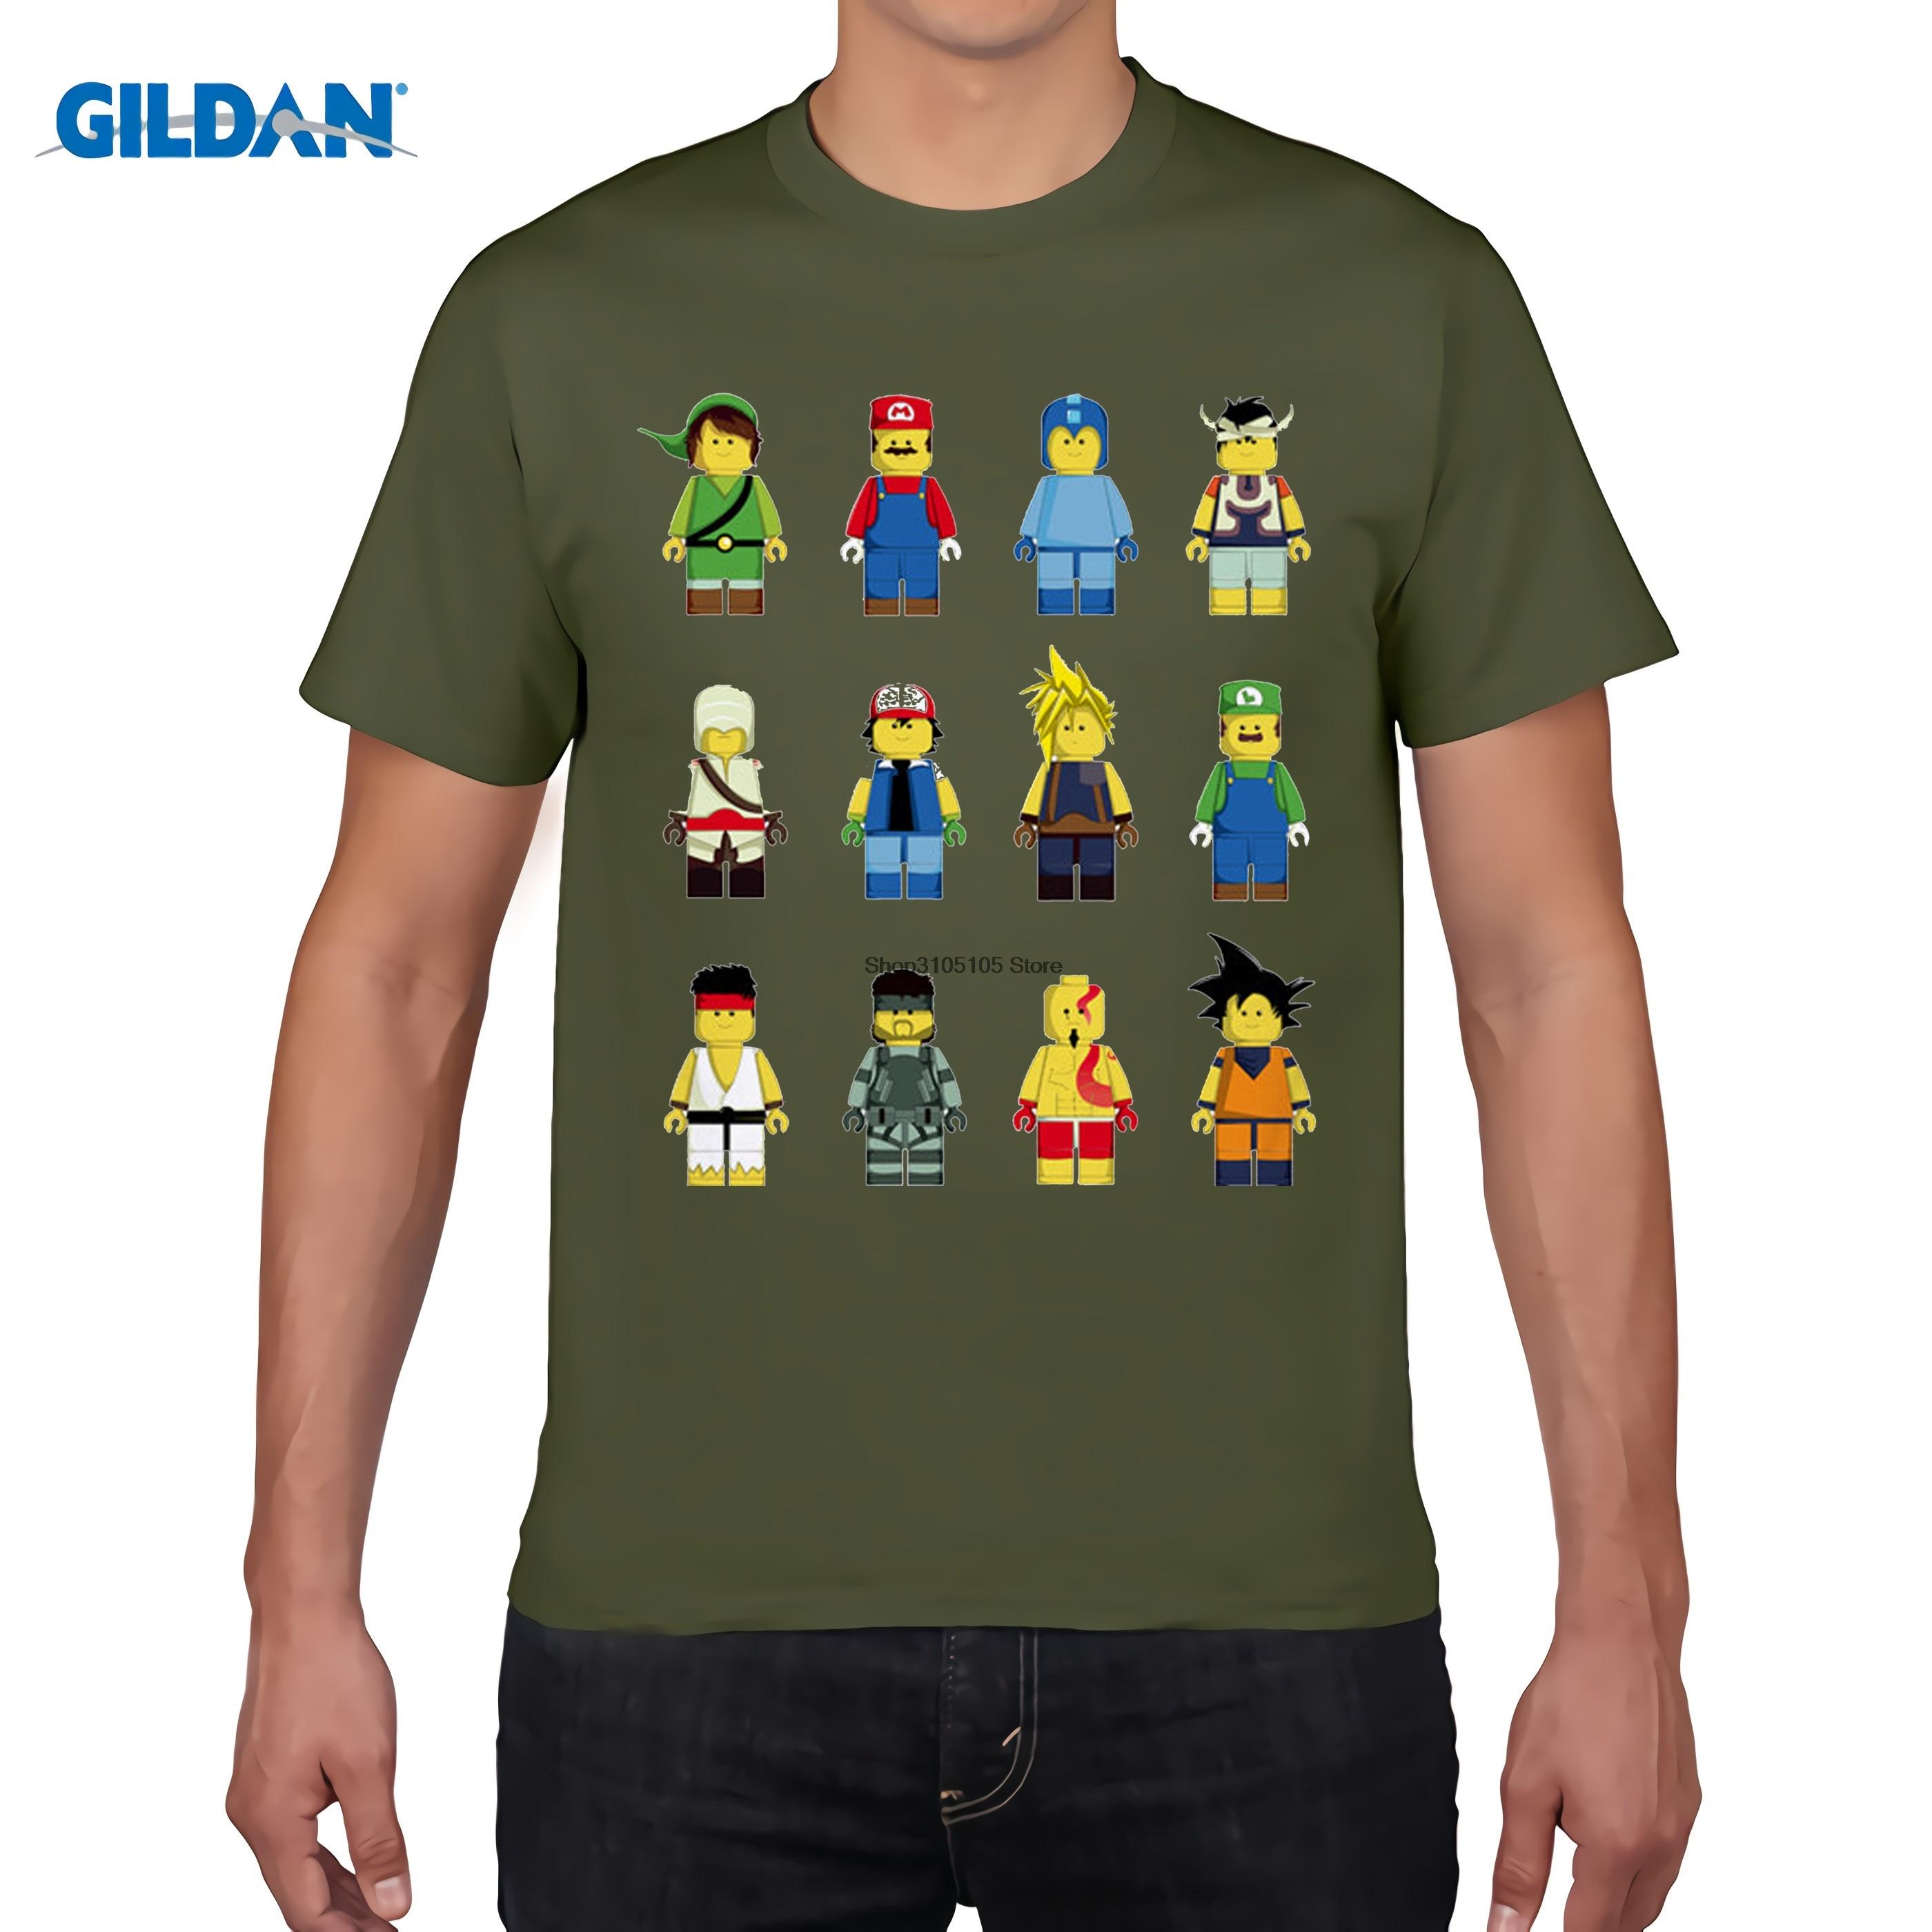 Shop customer account login/admin/Cms_Wysiwyg/directive/index - Design T Shirt Store Downloader Gildan Funny Men T Shirt 2017 Summer Cosplay Design